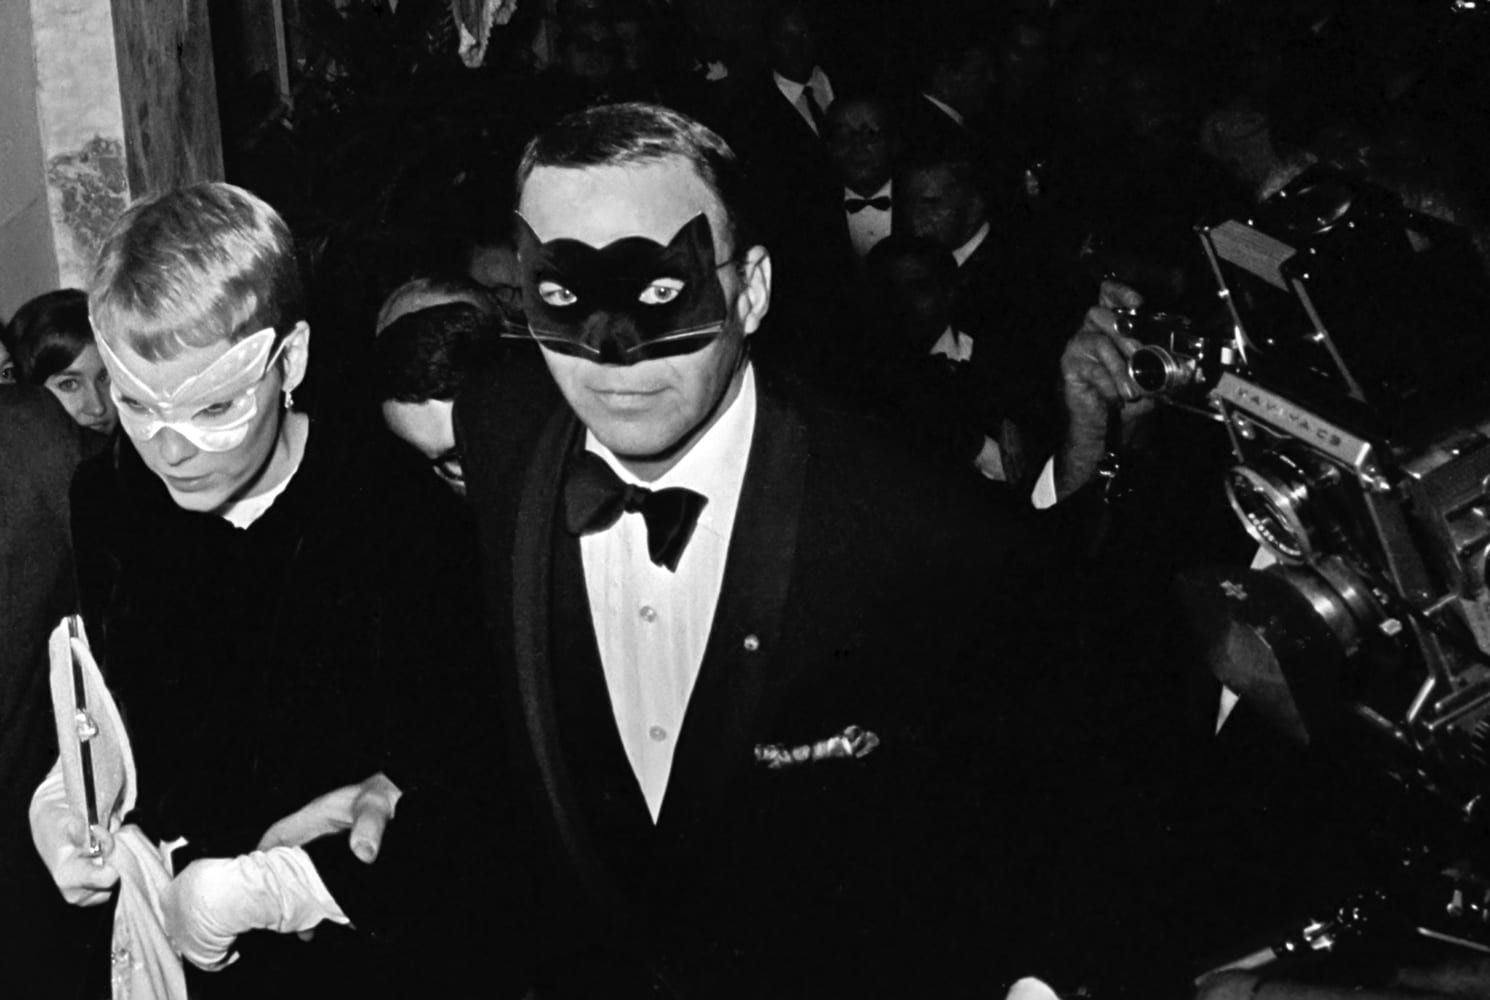 Harry Benson, Frank Sinatra and Mia Farrow at Truman Capote's Black and White Ball